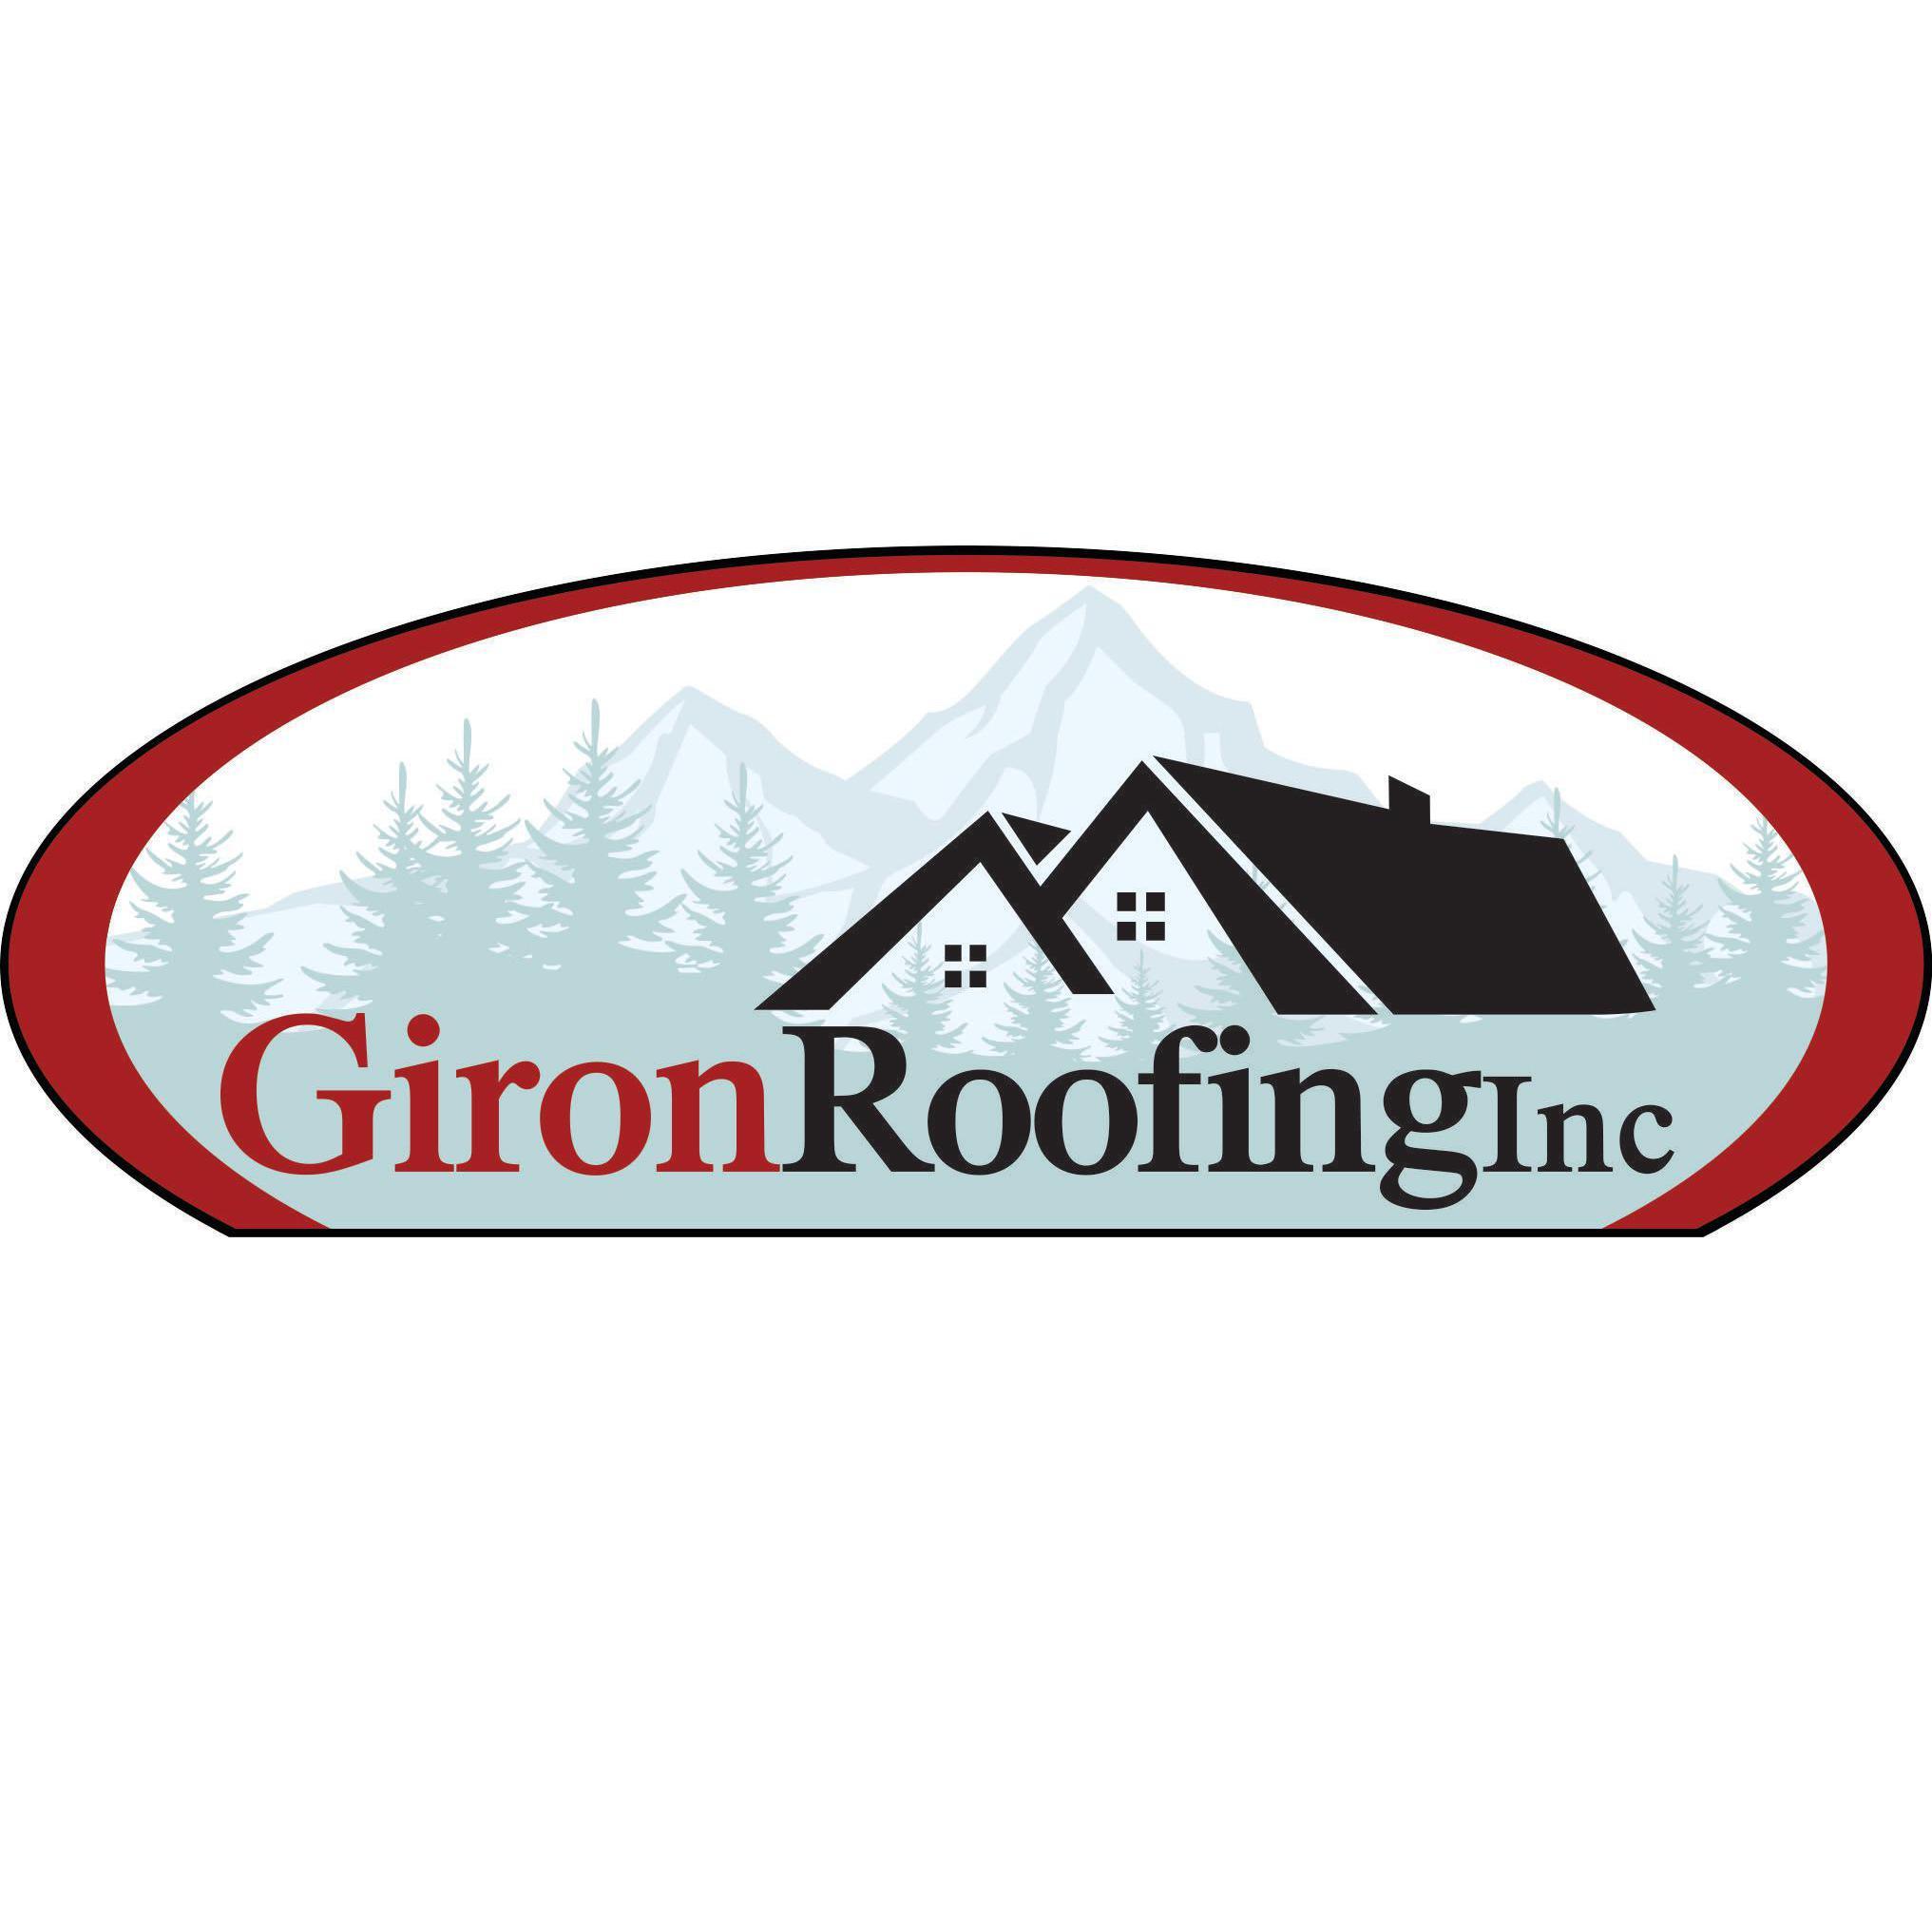 Giron Roofing Inc